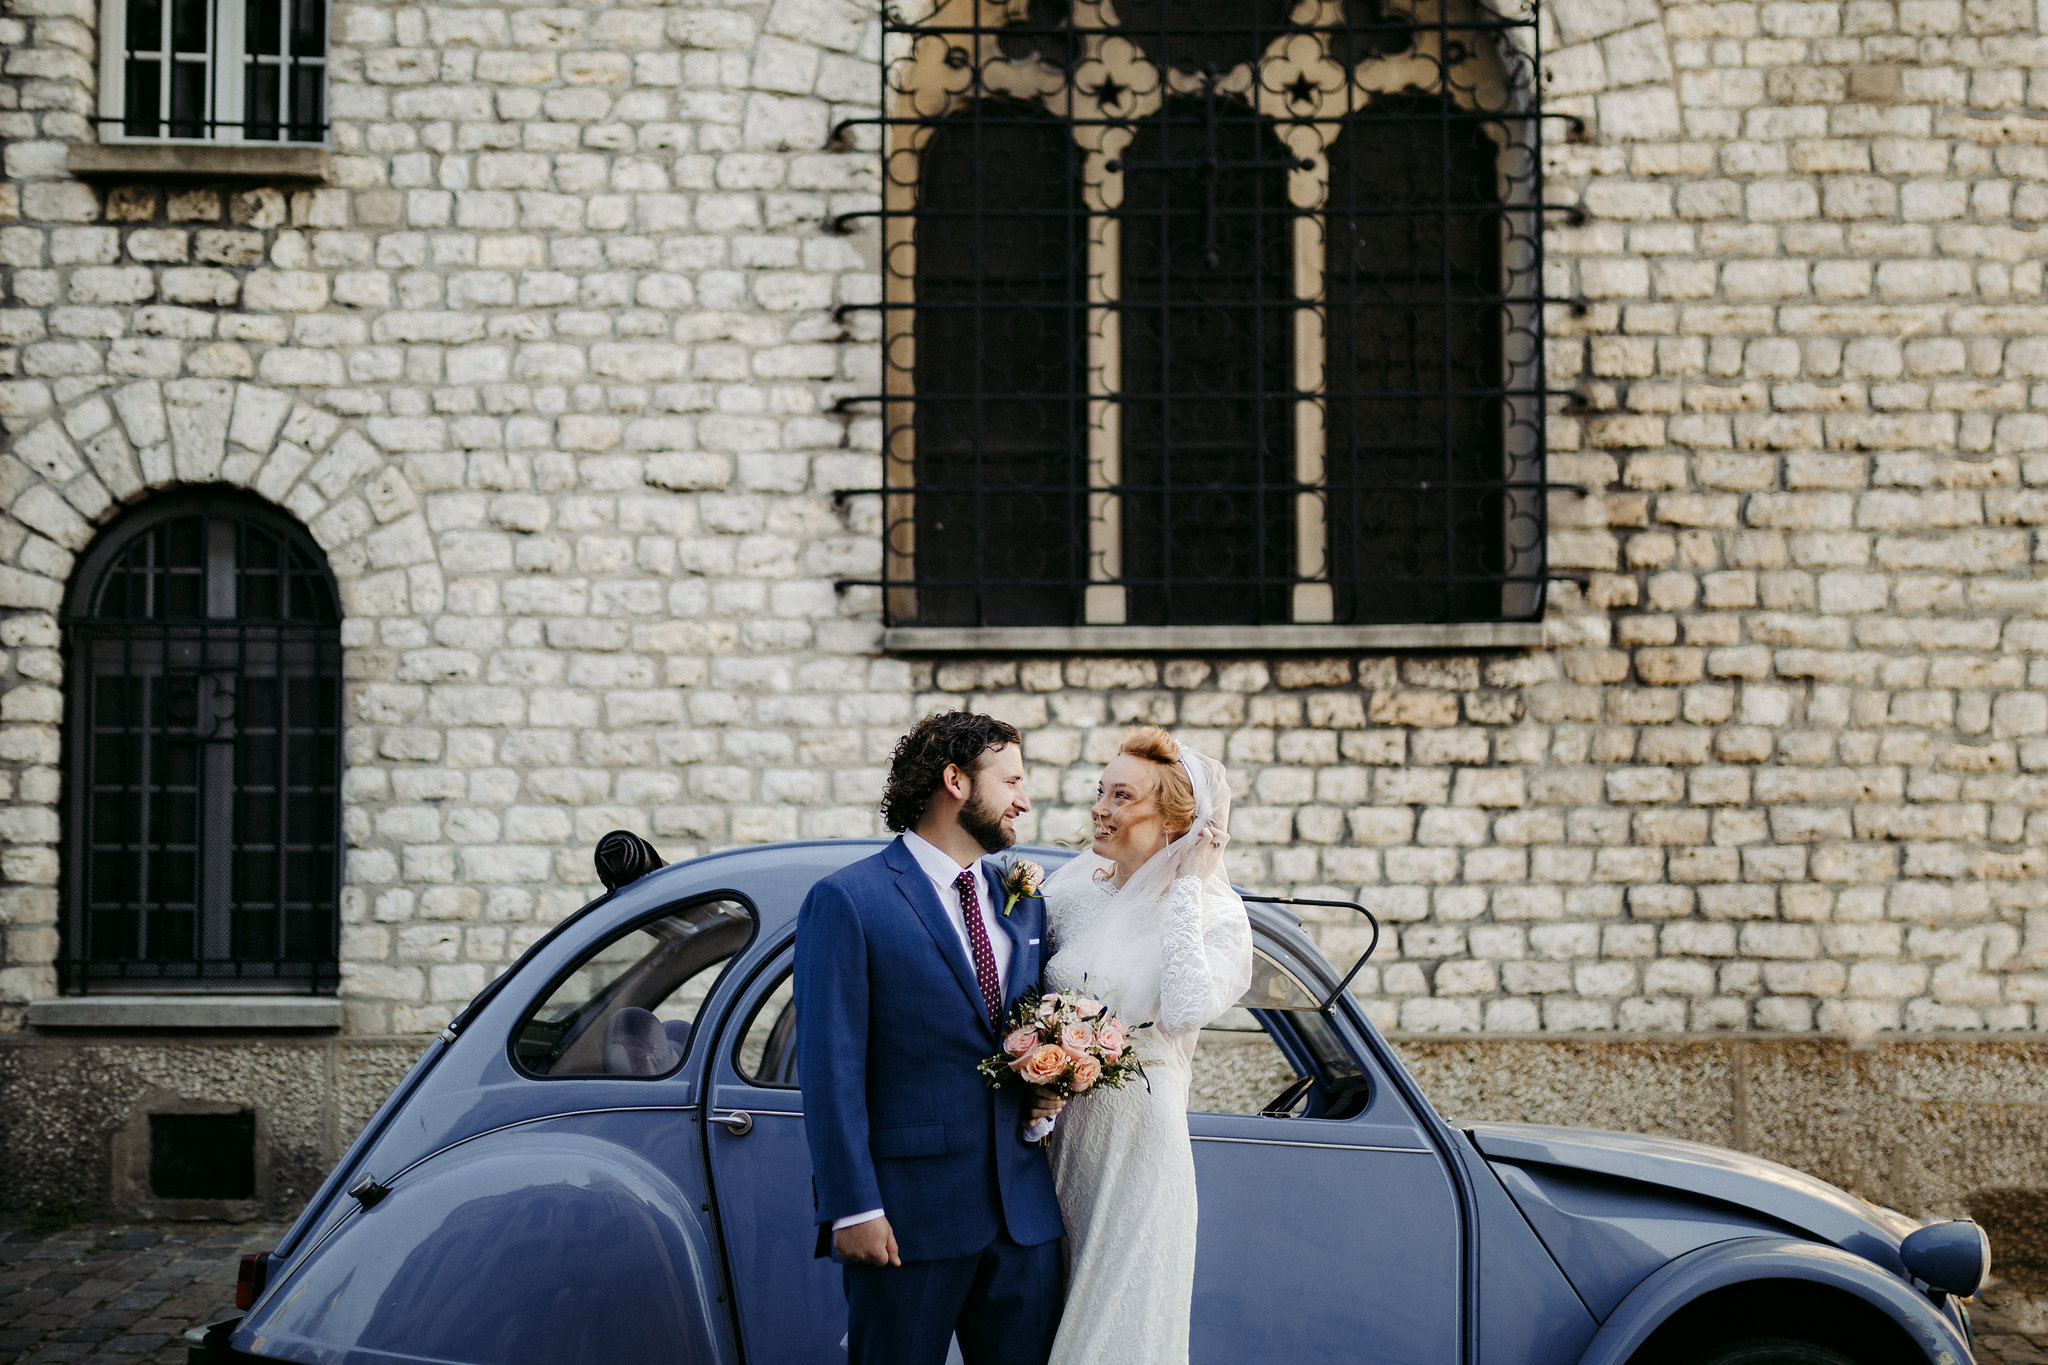 Paris_elopement_wedding_photographer-143.jpg